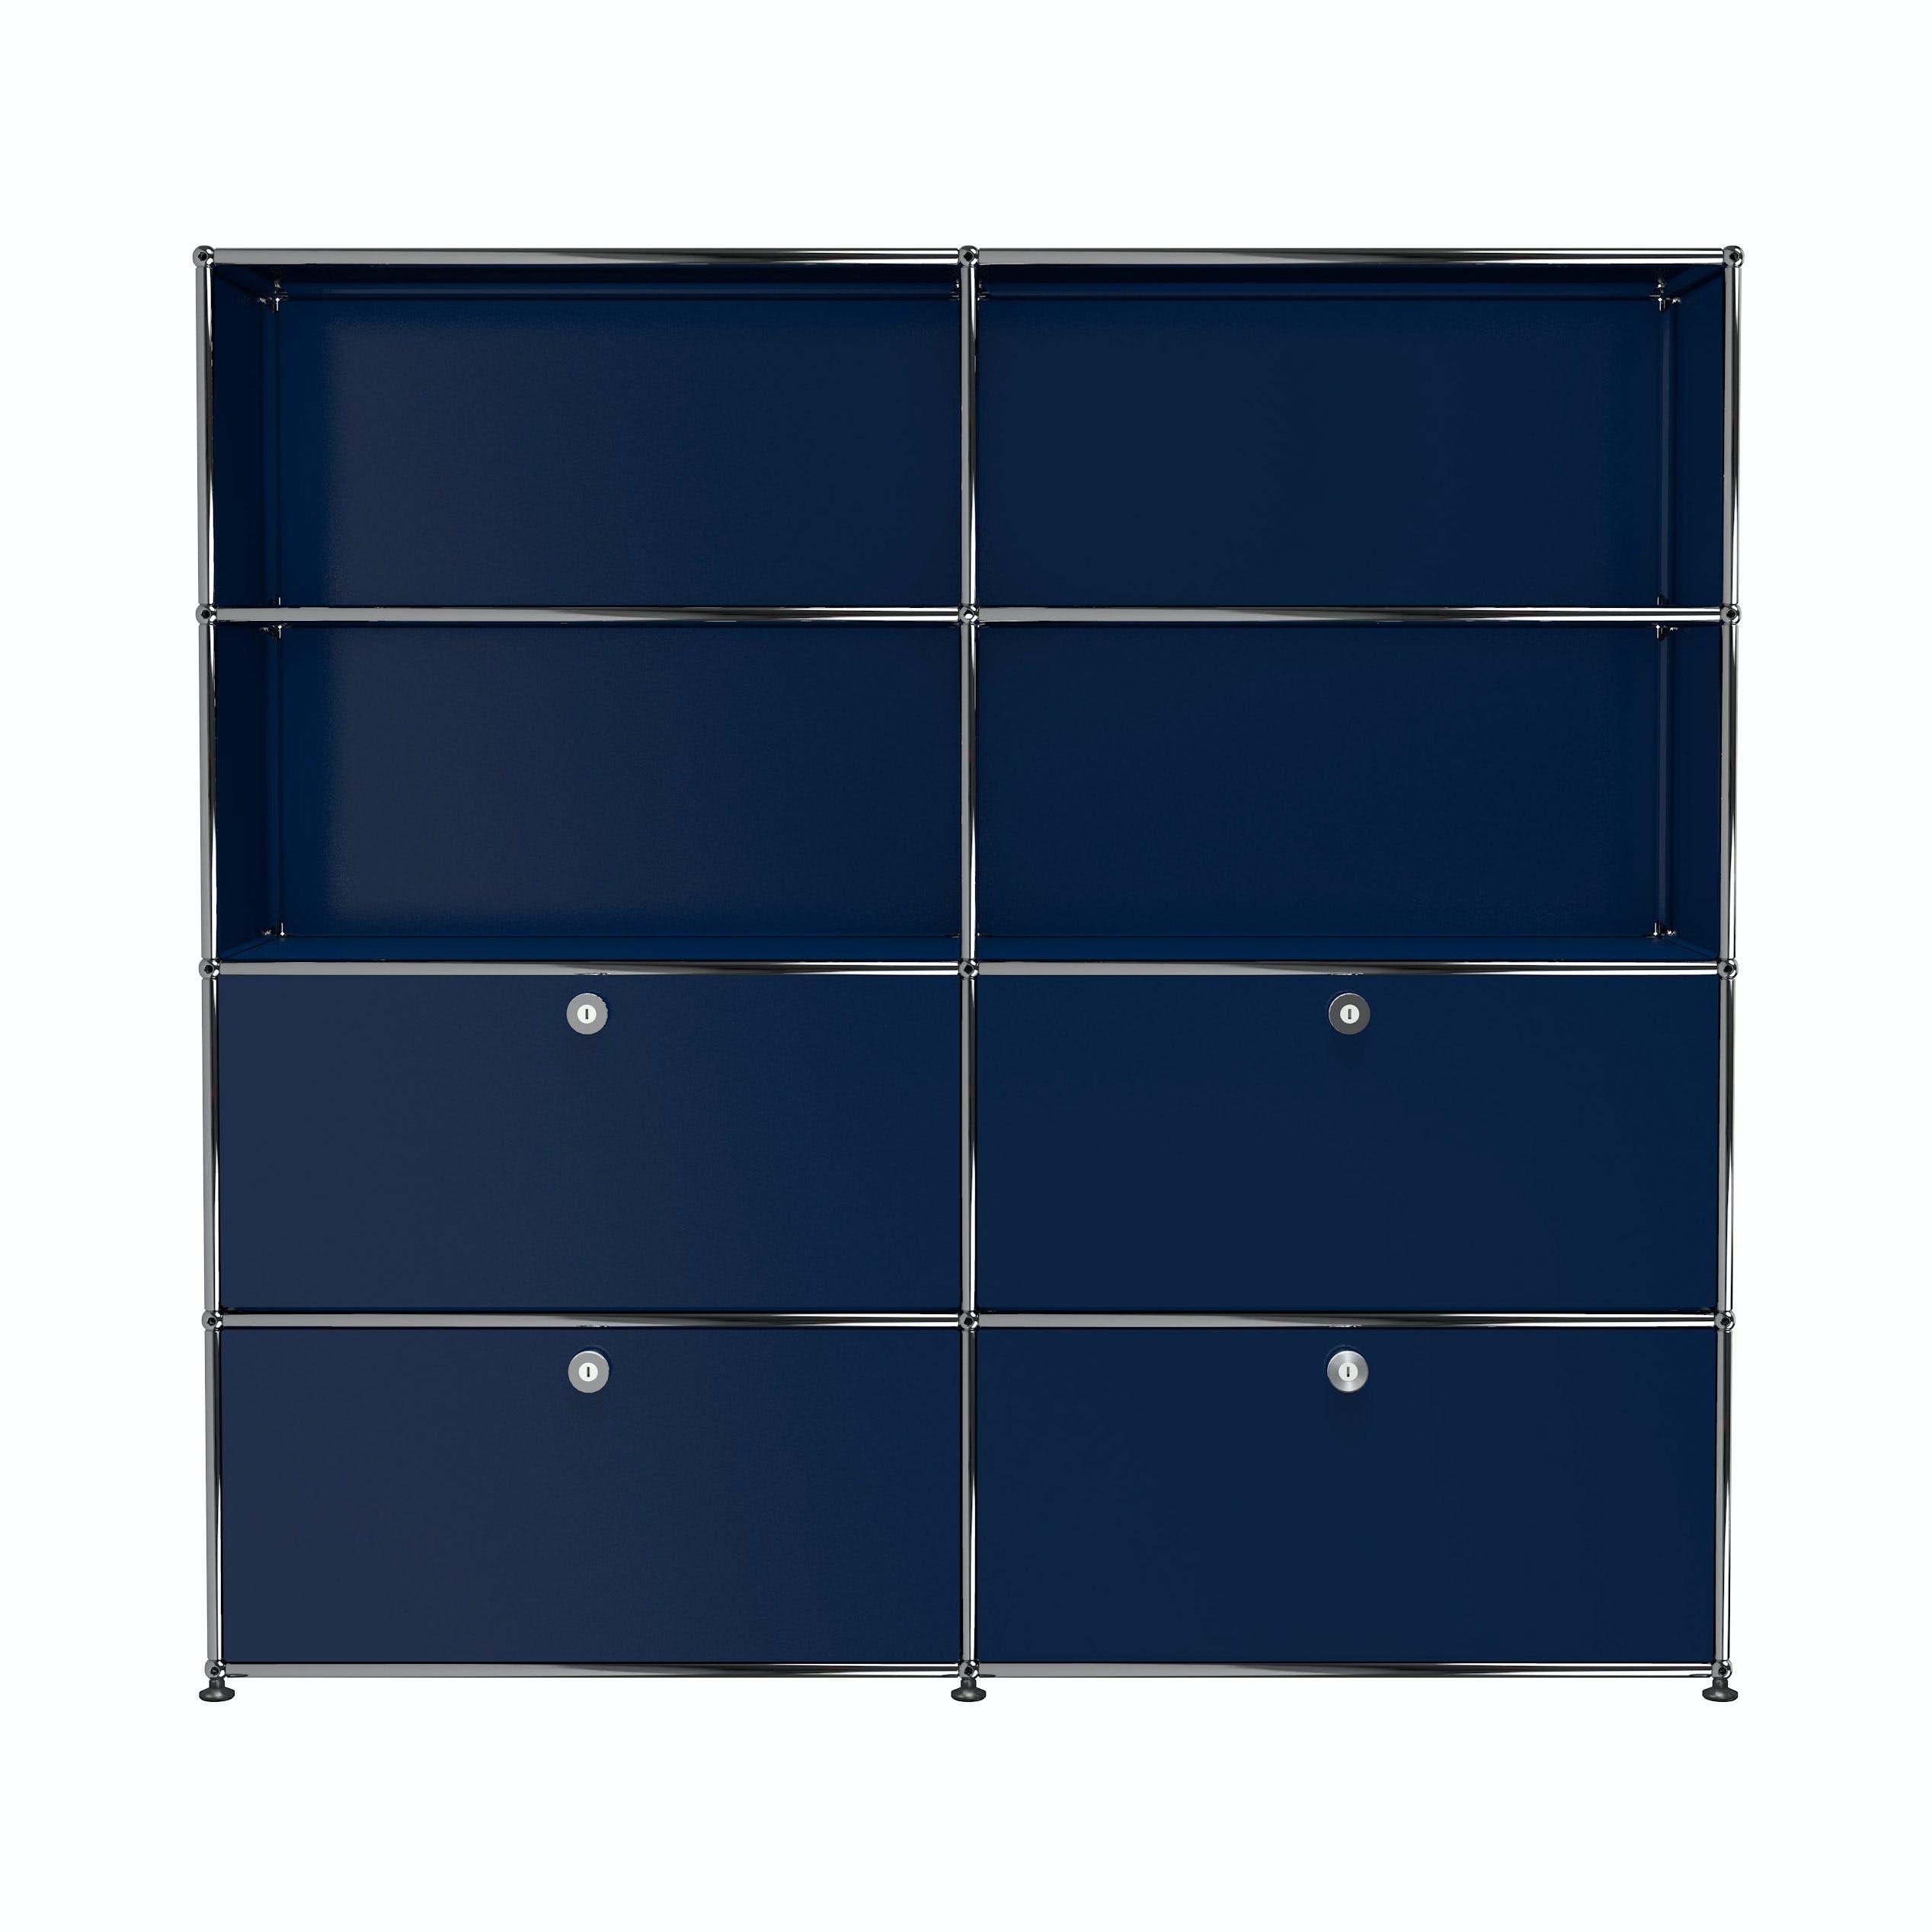 Usm-quick-ship-Haller-Storage-S2-steel-blue-haute-living